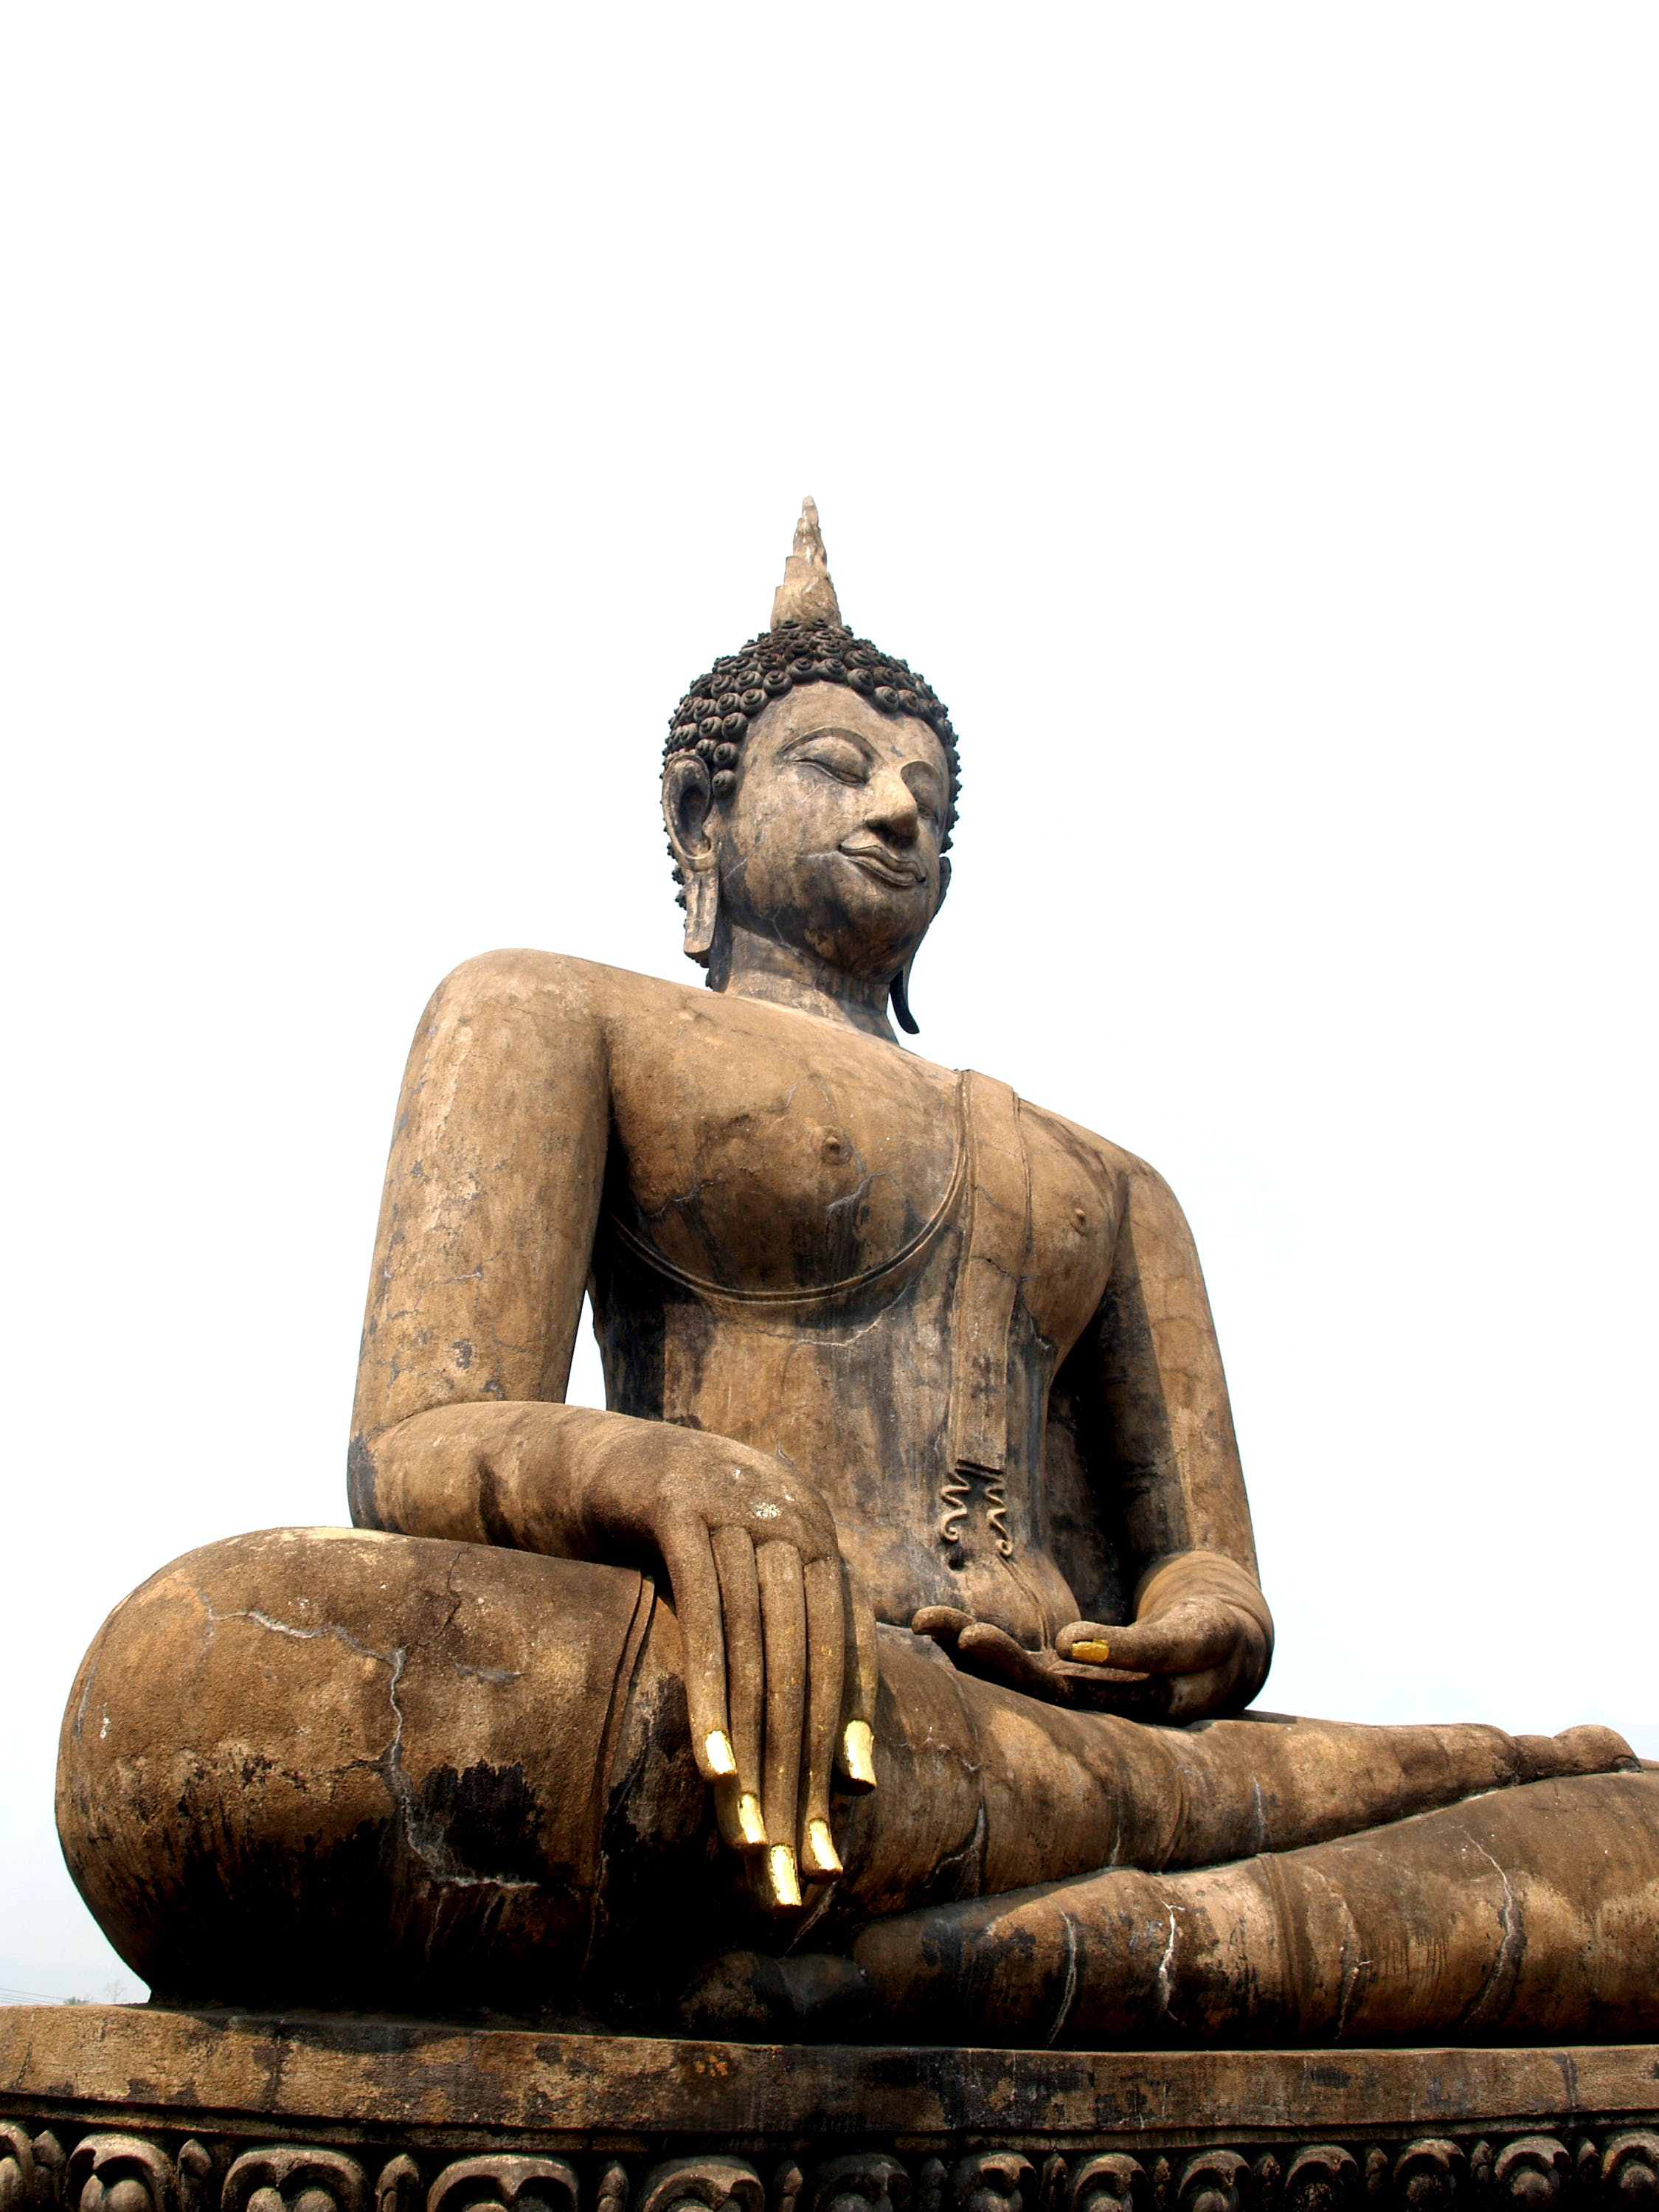 Free stock photo of architecture, statue, sculpture, religion